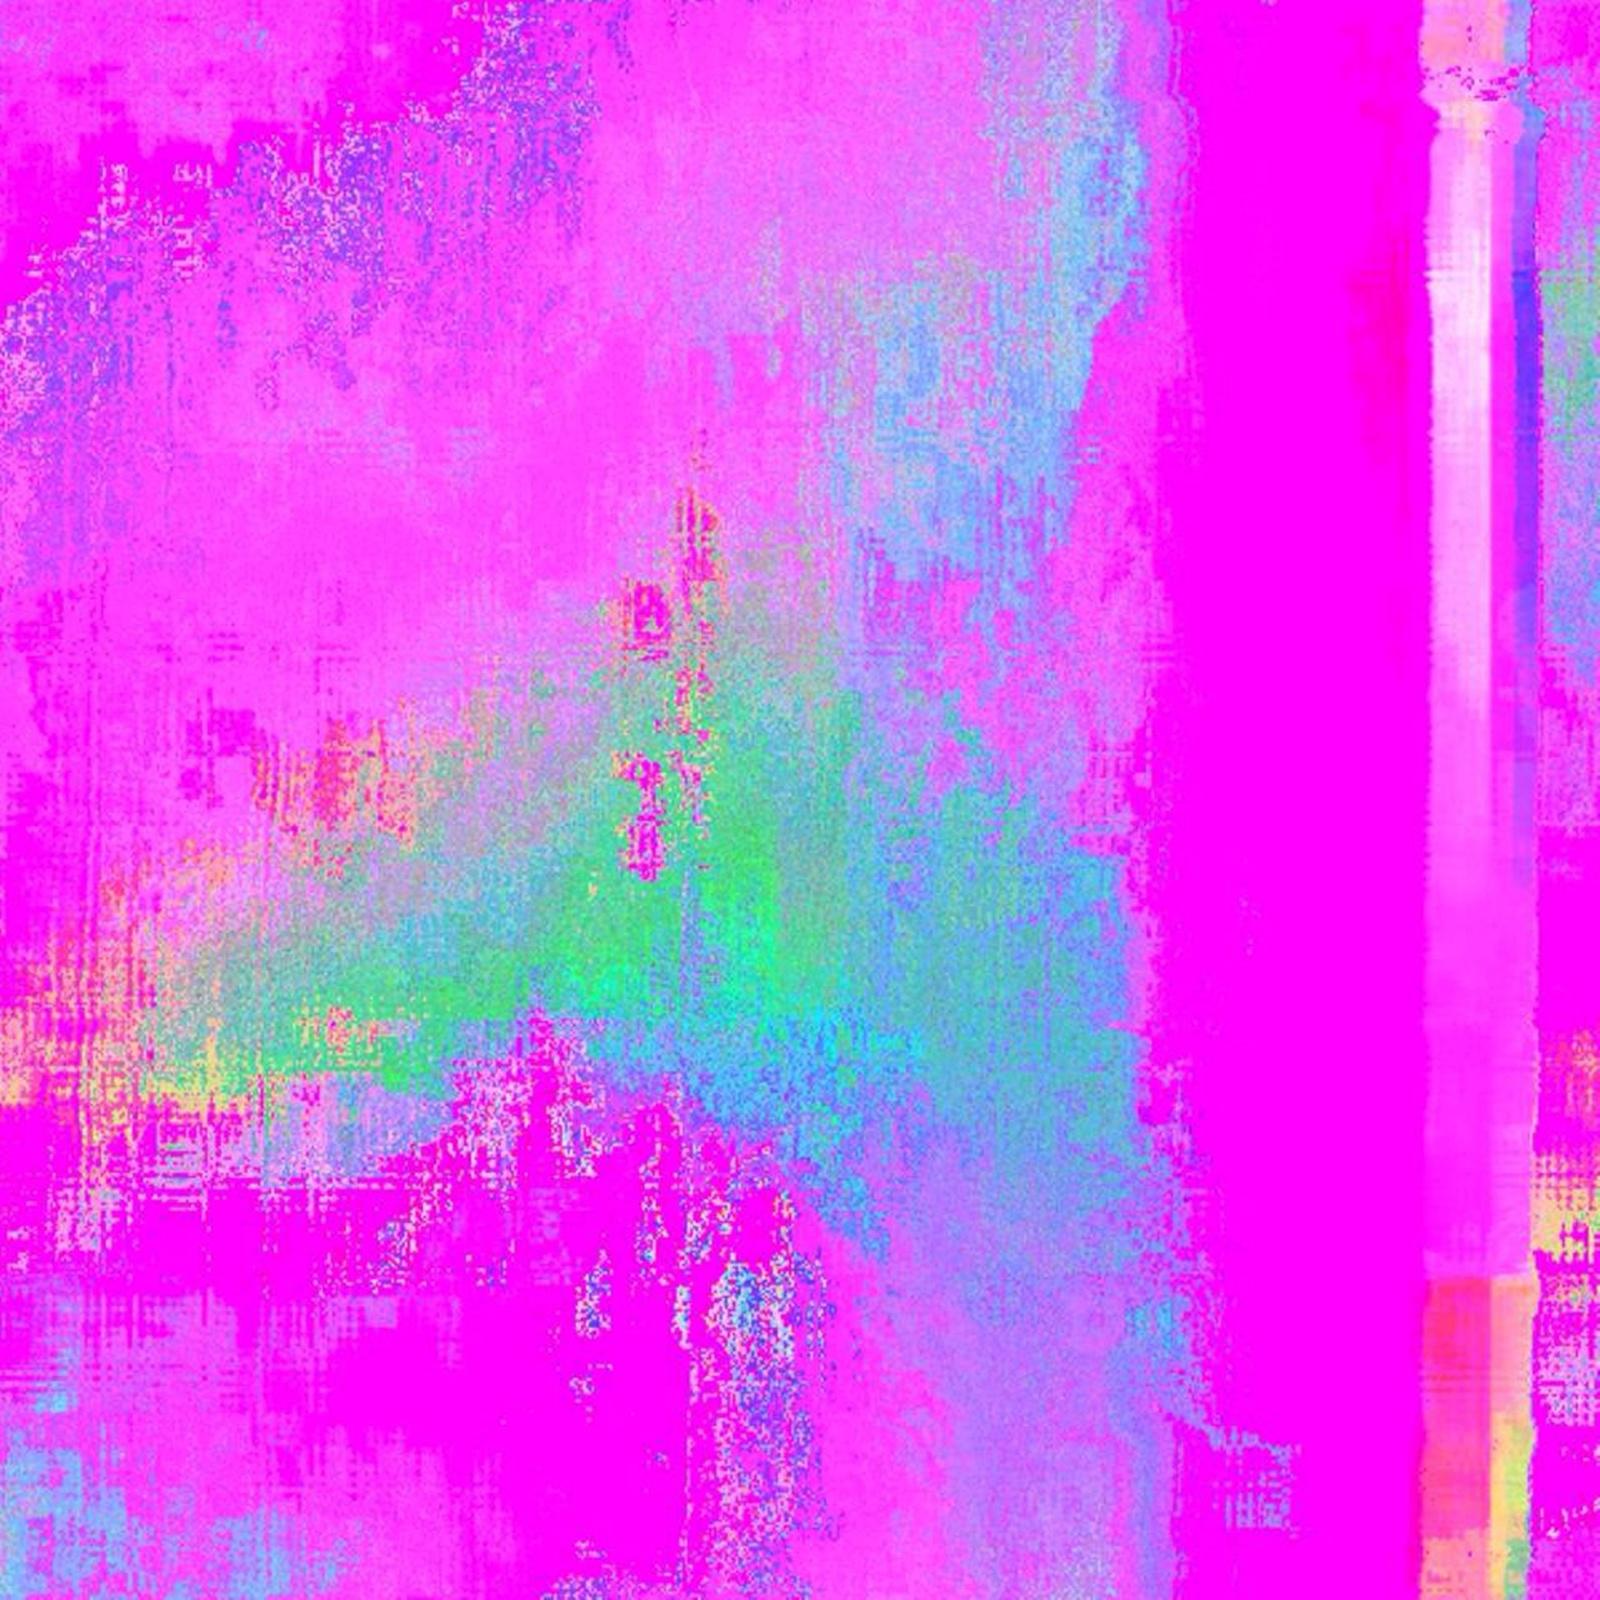 162653-8442680-glitch_something.jpg